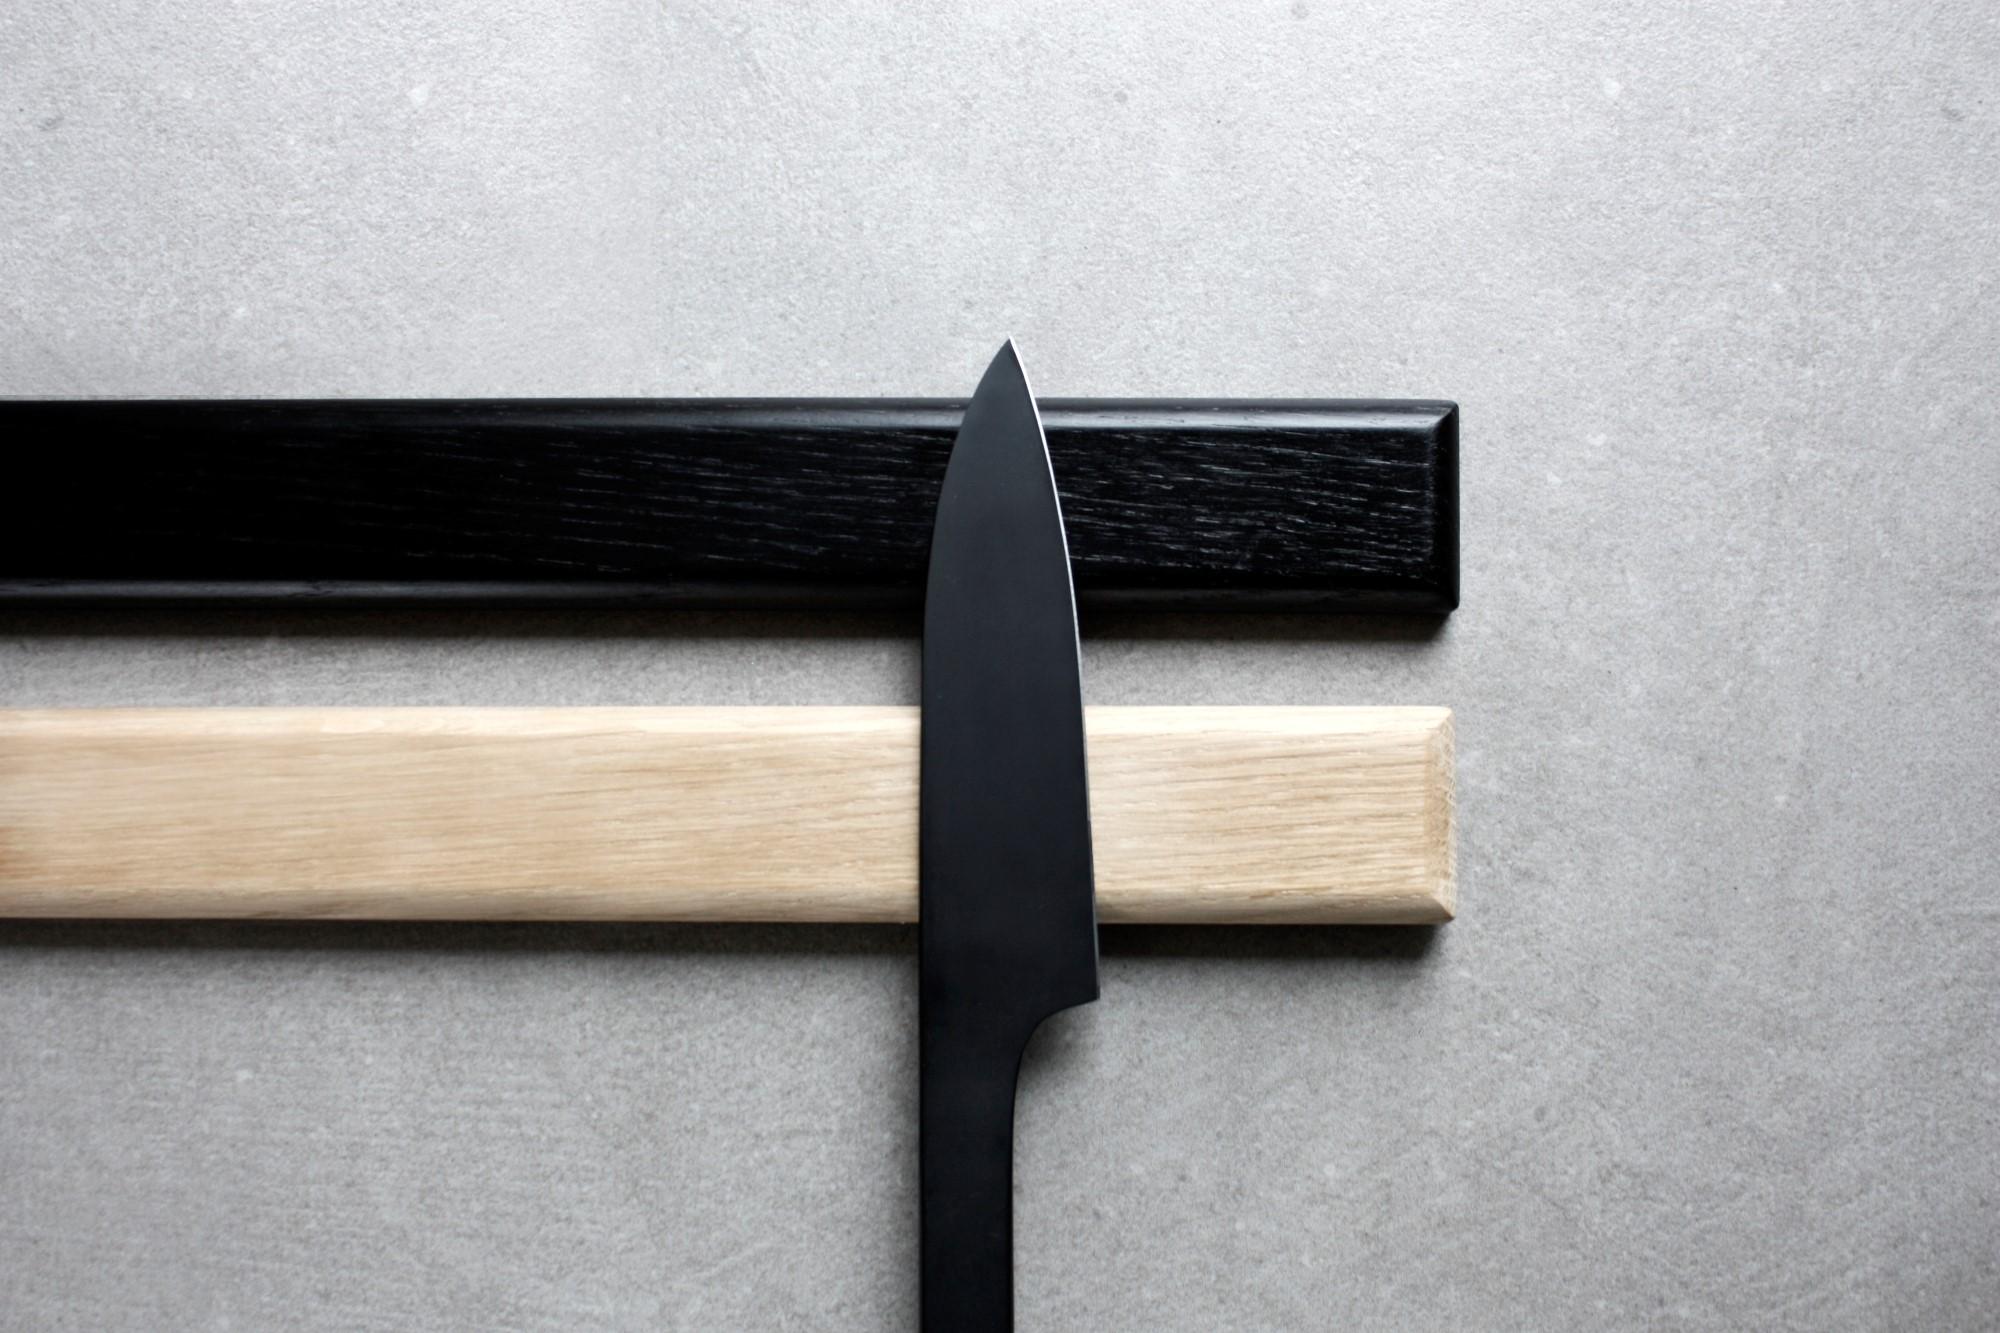 JOVI knivmagnet / knife magnet